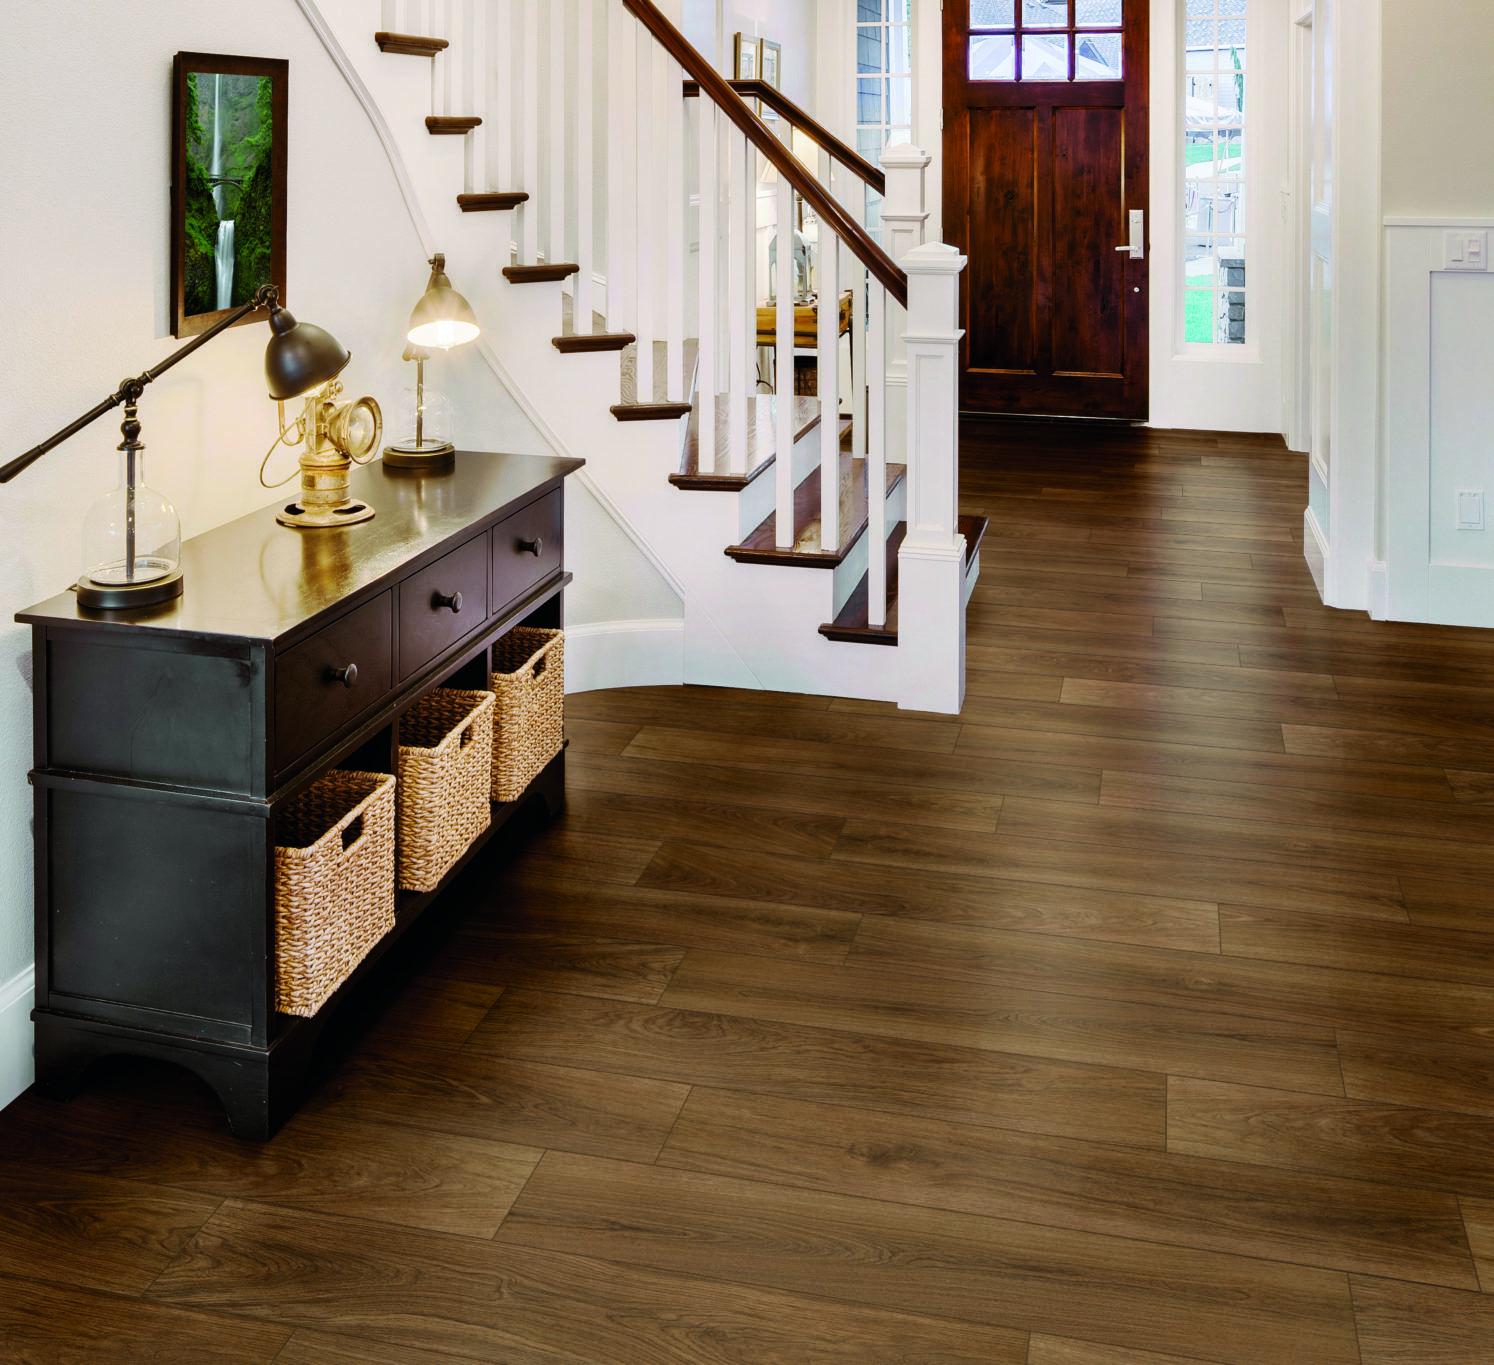 Entry Foyer Homecoming Wood Look Tile Floor Tile Design Wood Tile Floors